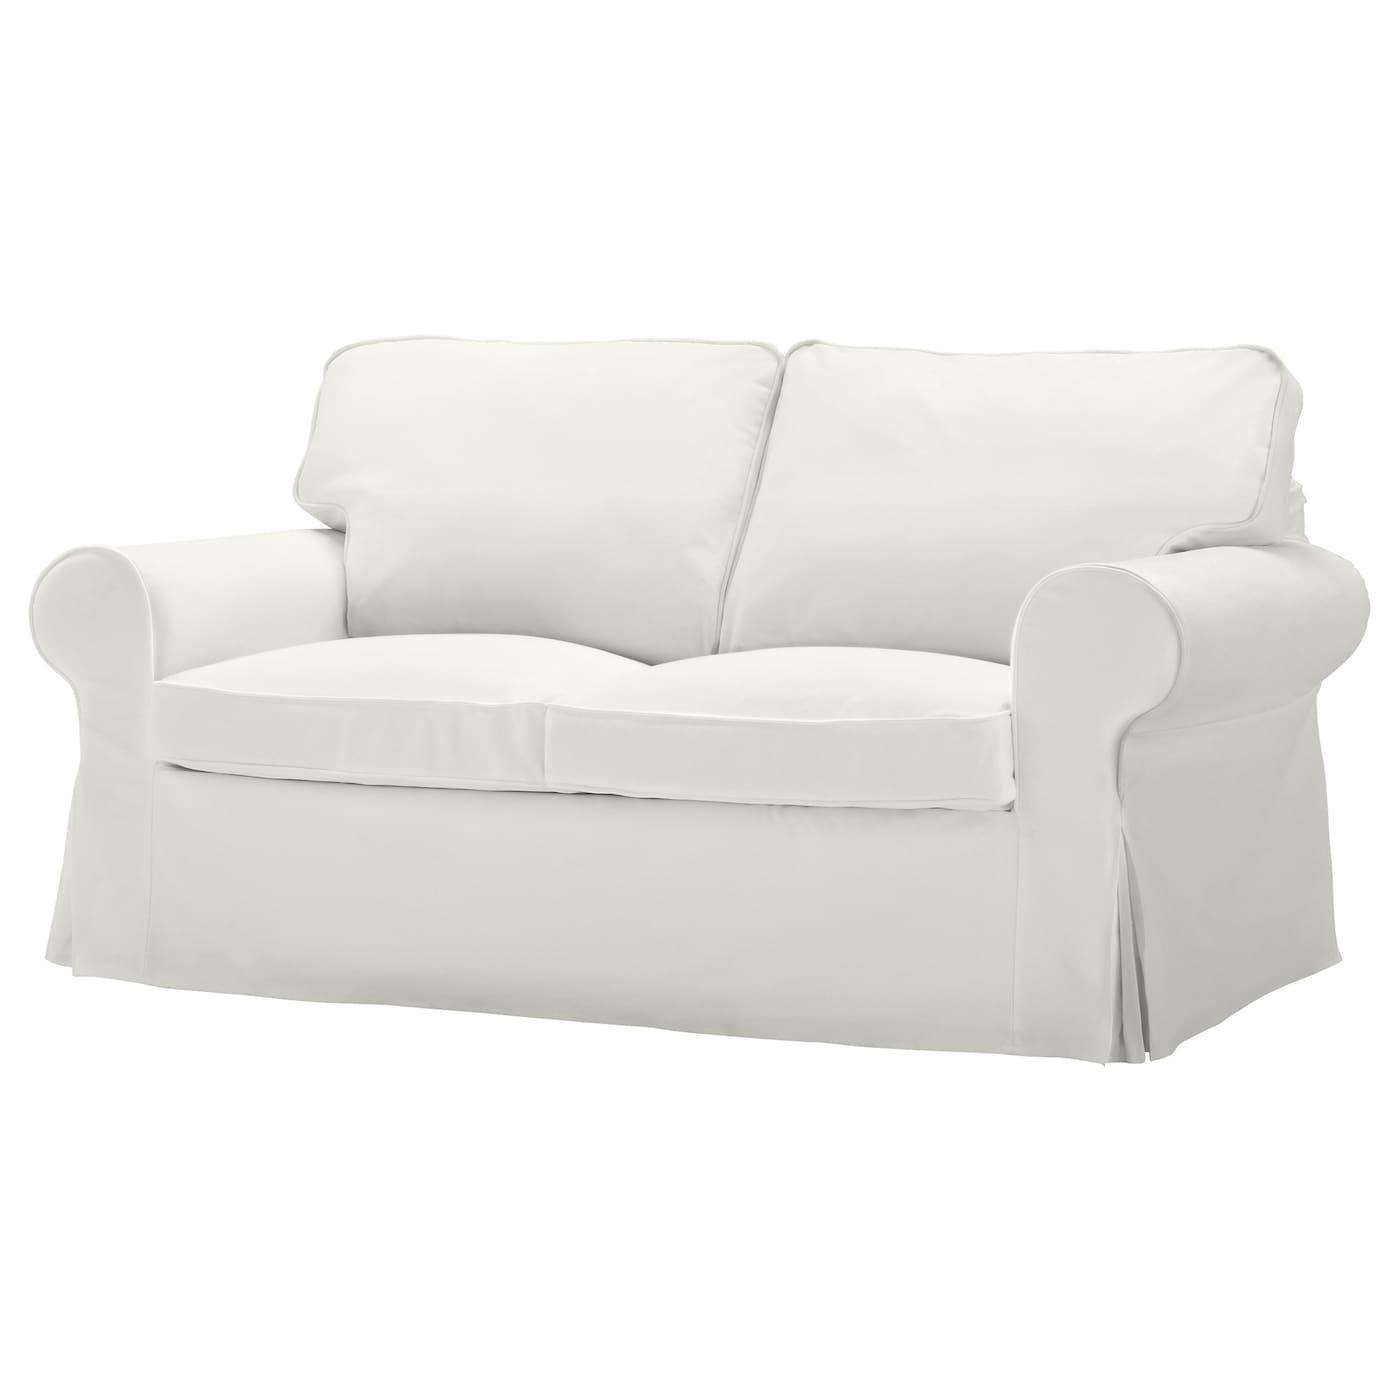 Ektorp Blekinge White Two Seat Sofa Ikea